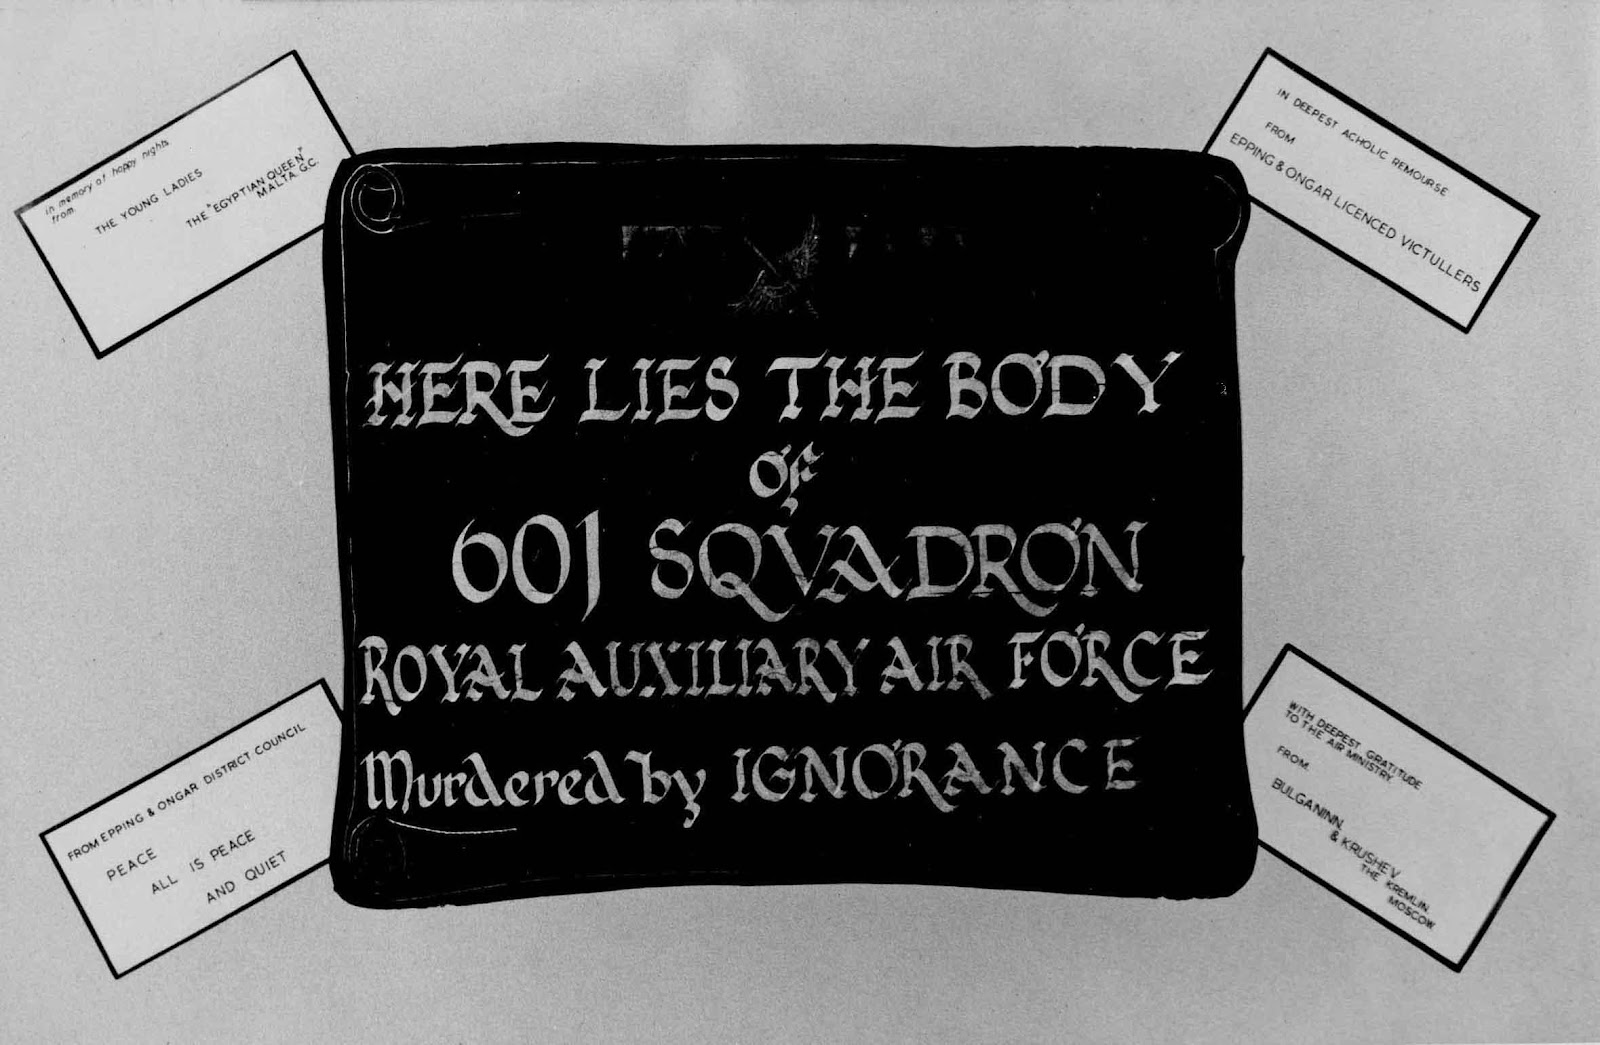 Here lies 601 squadron